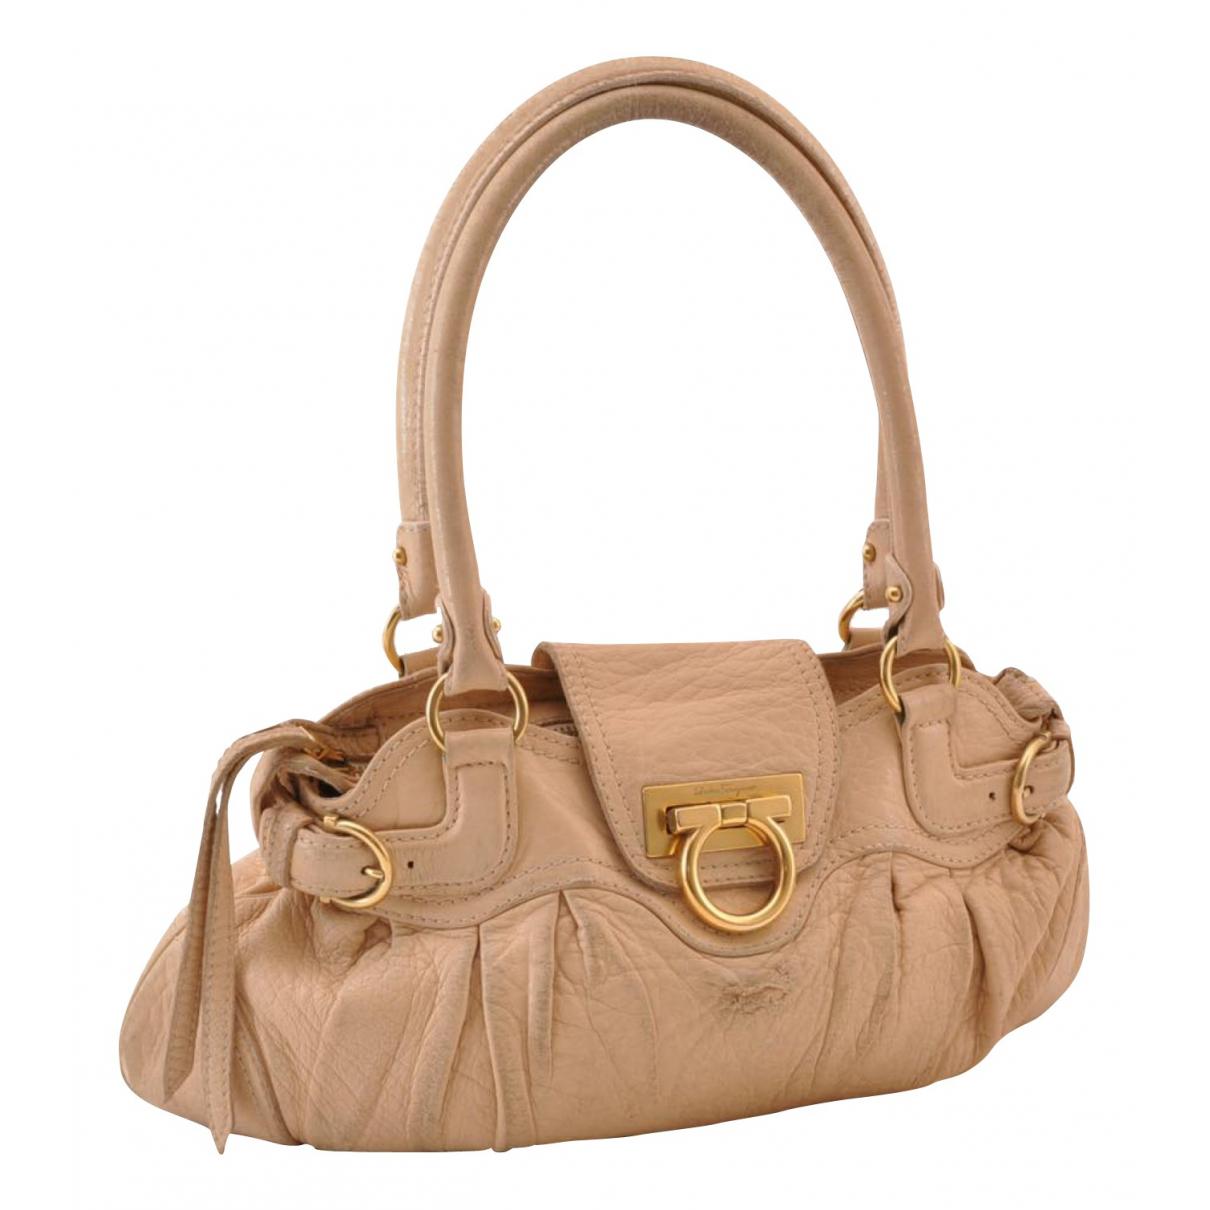 Salvatore Ferragamo N Beige Leather handbag for Women N